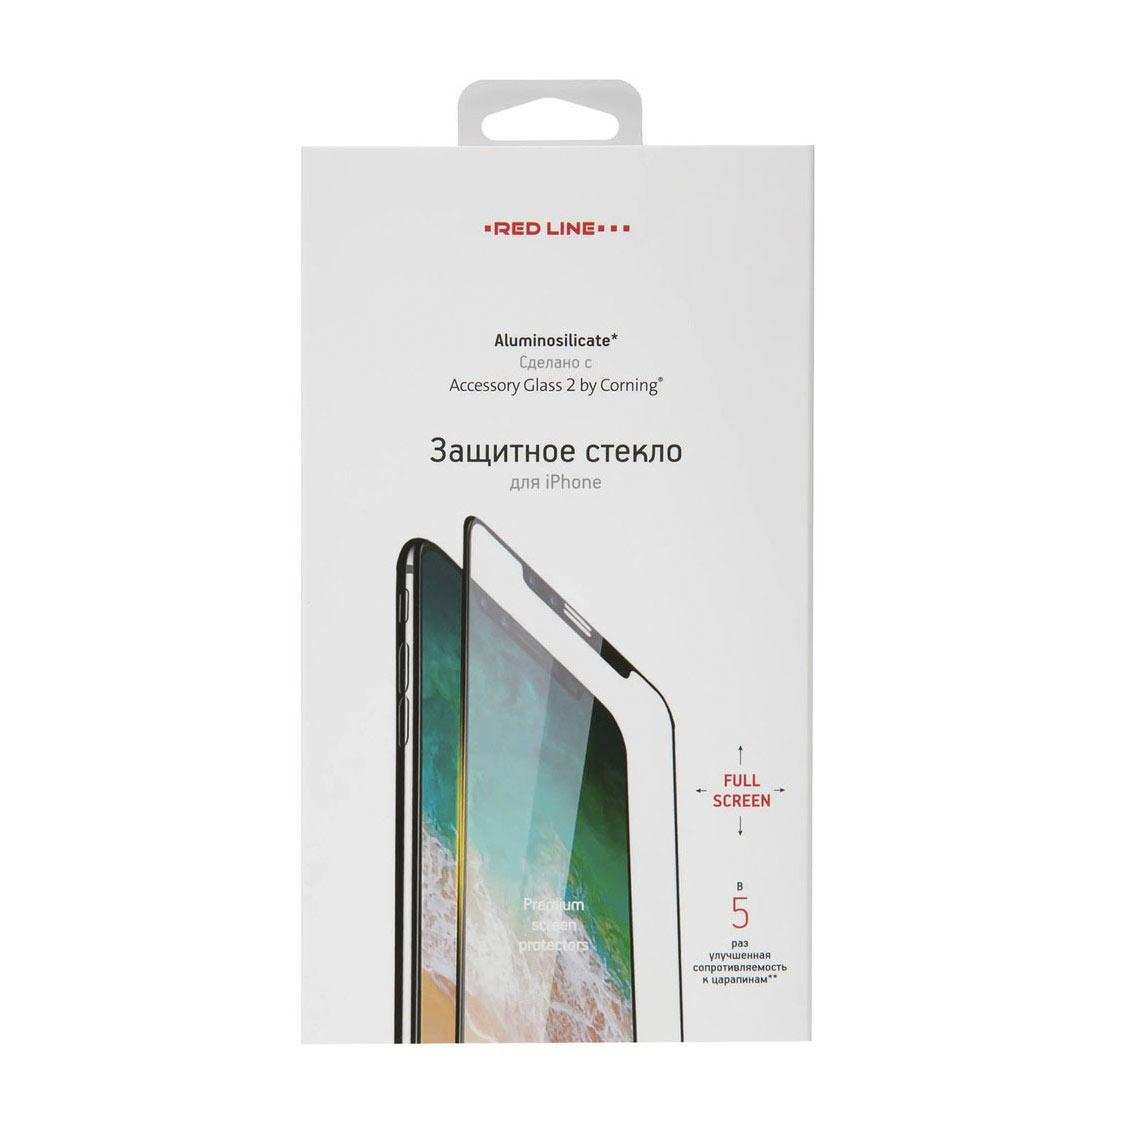 Фото - Защитное стекло Red Line Corning Full Screen для Apple iPhone 12 mini, чёрная рамка защитное стекло red line corning full screen для apple iphone 12 pro черный